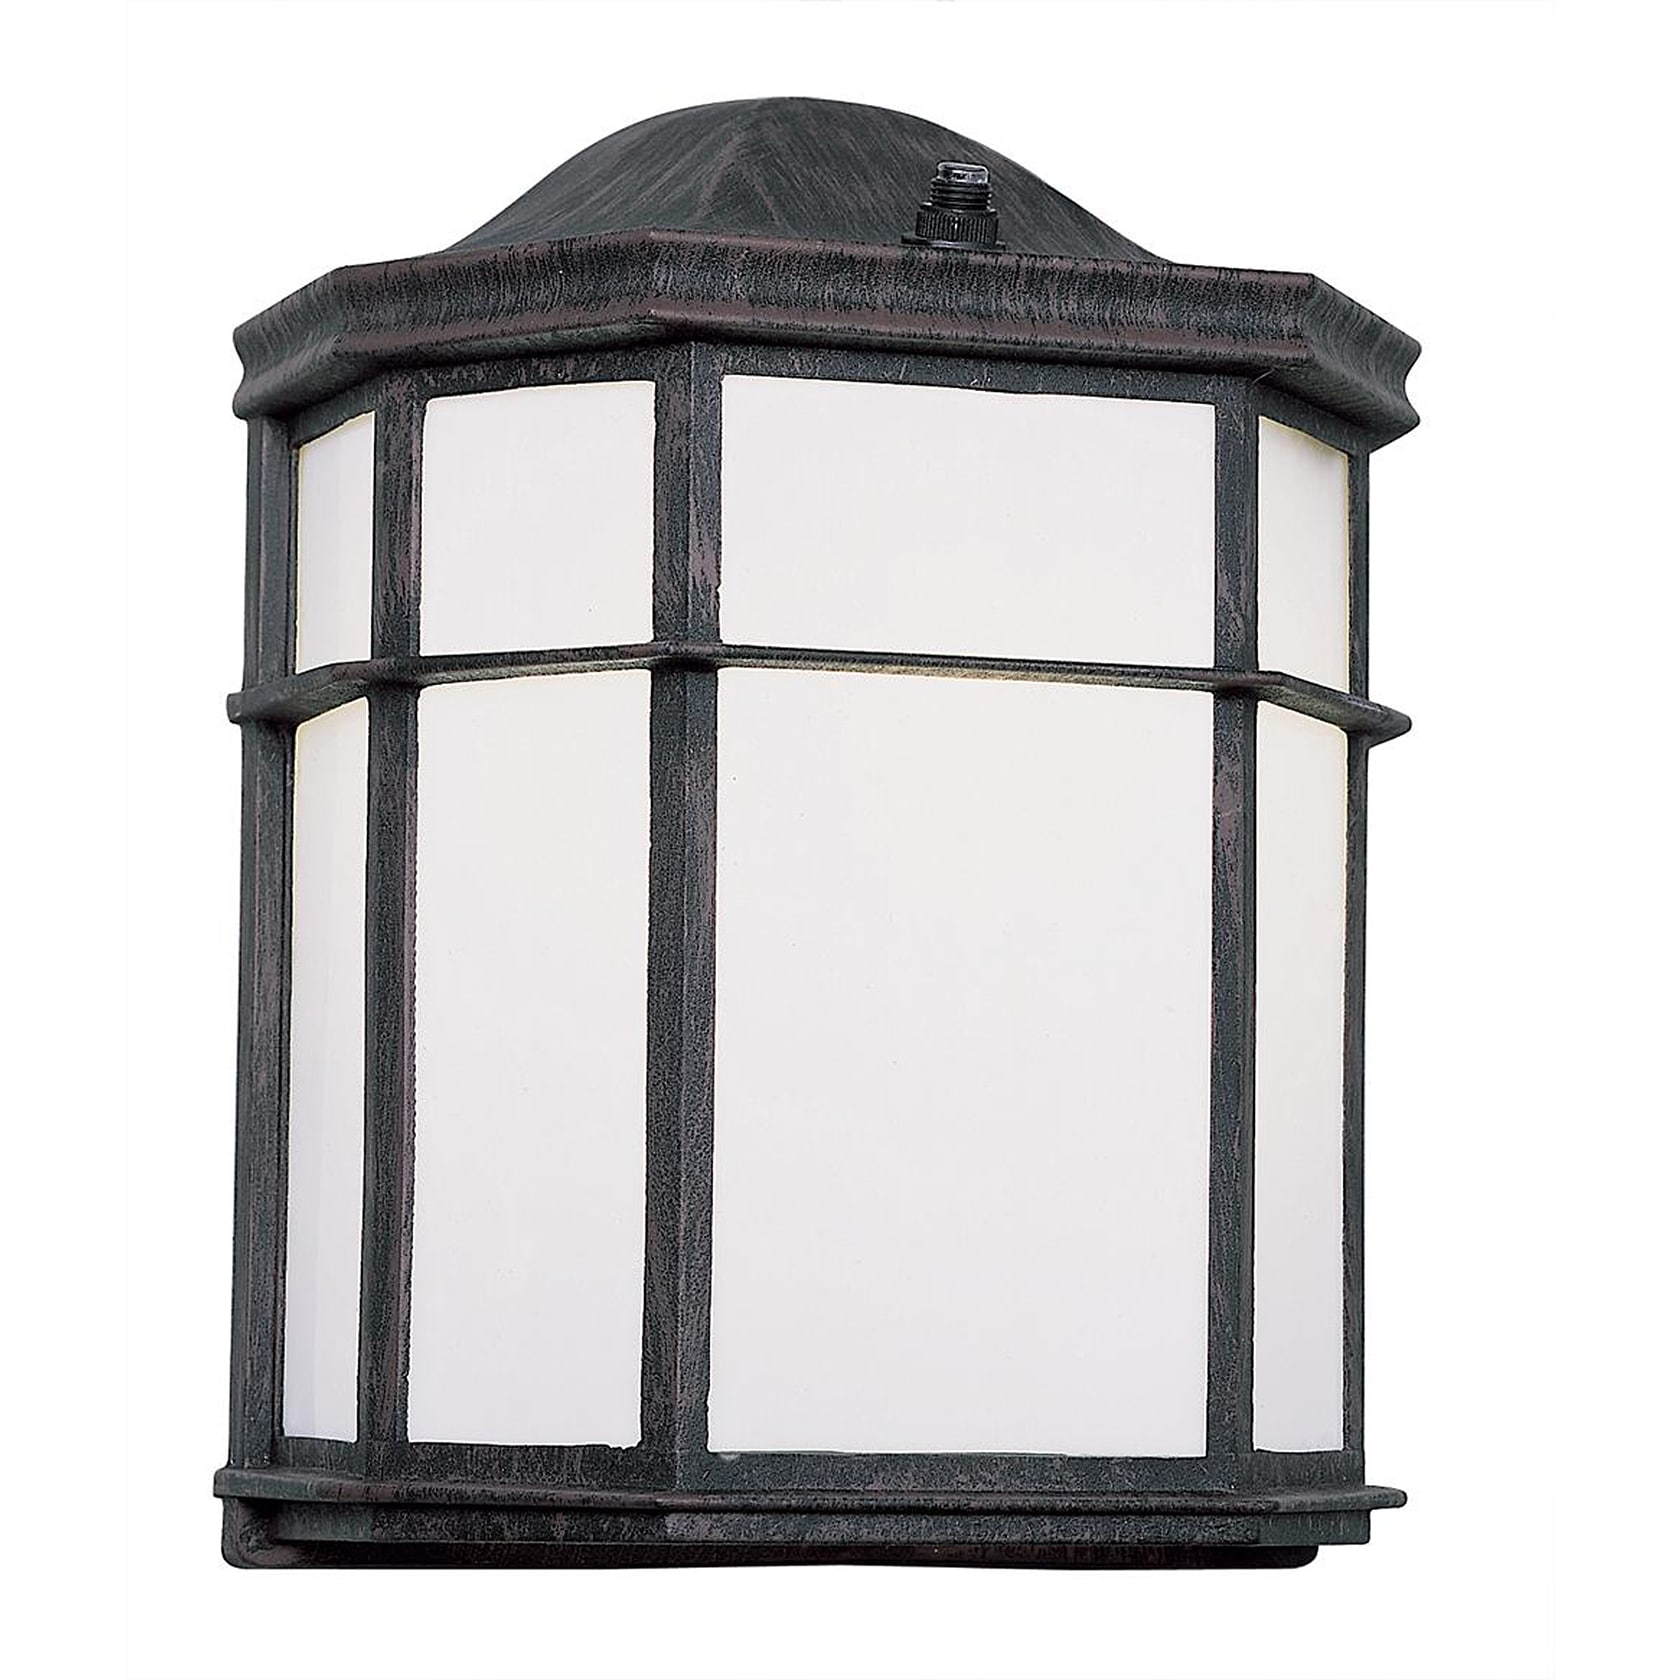 Bel Air Lighting CB-4484-BK 10-inch Black Pocket Mini Out...